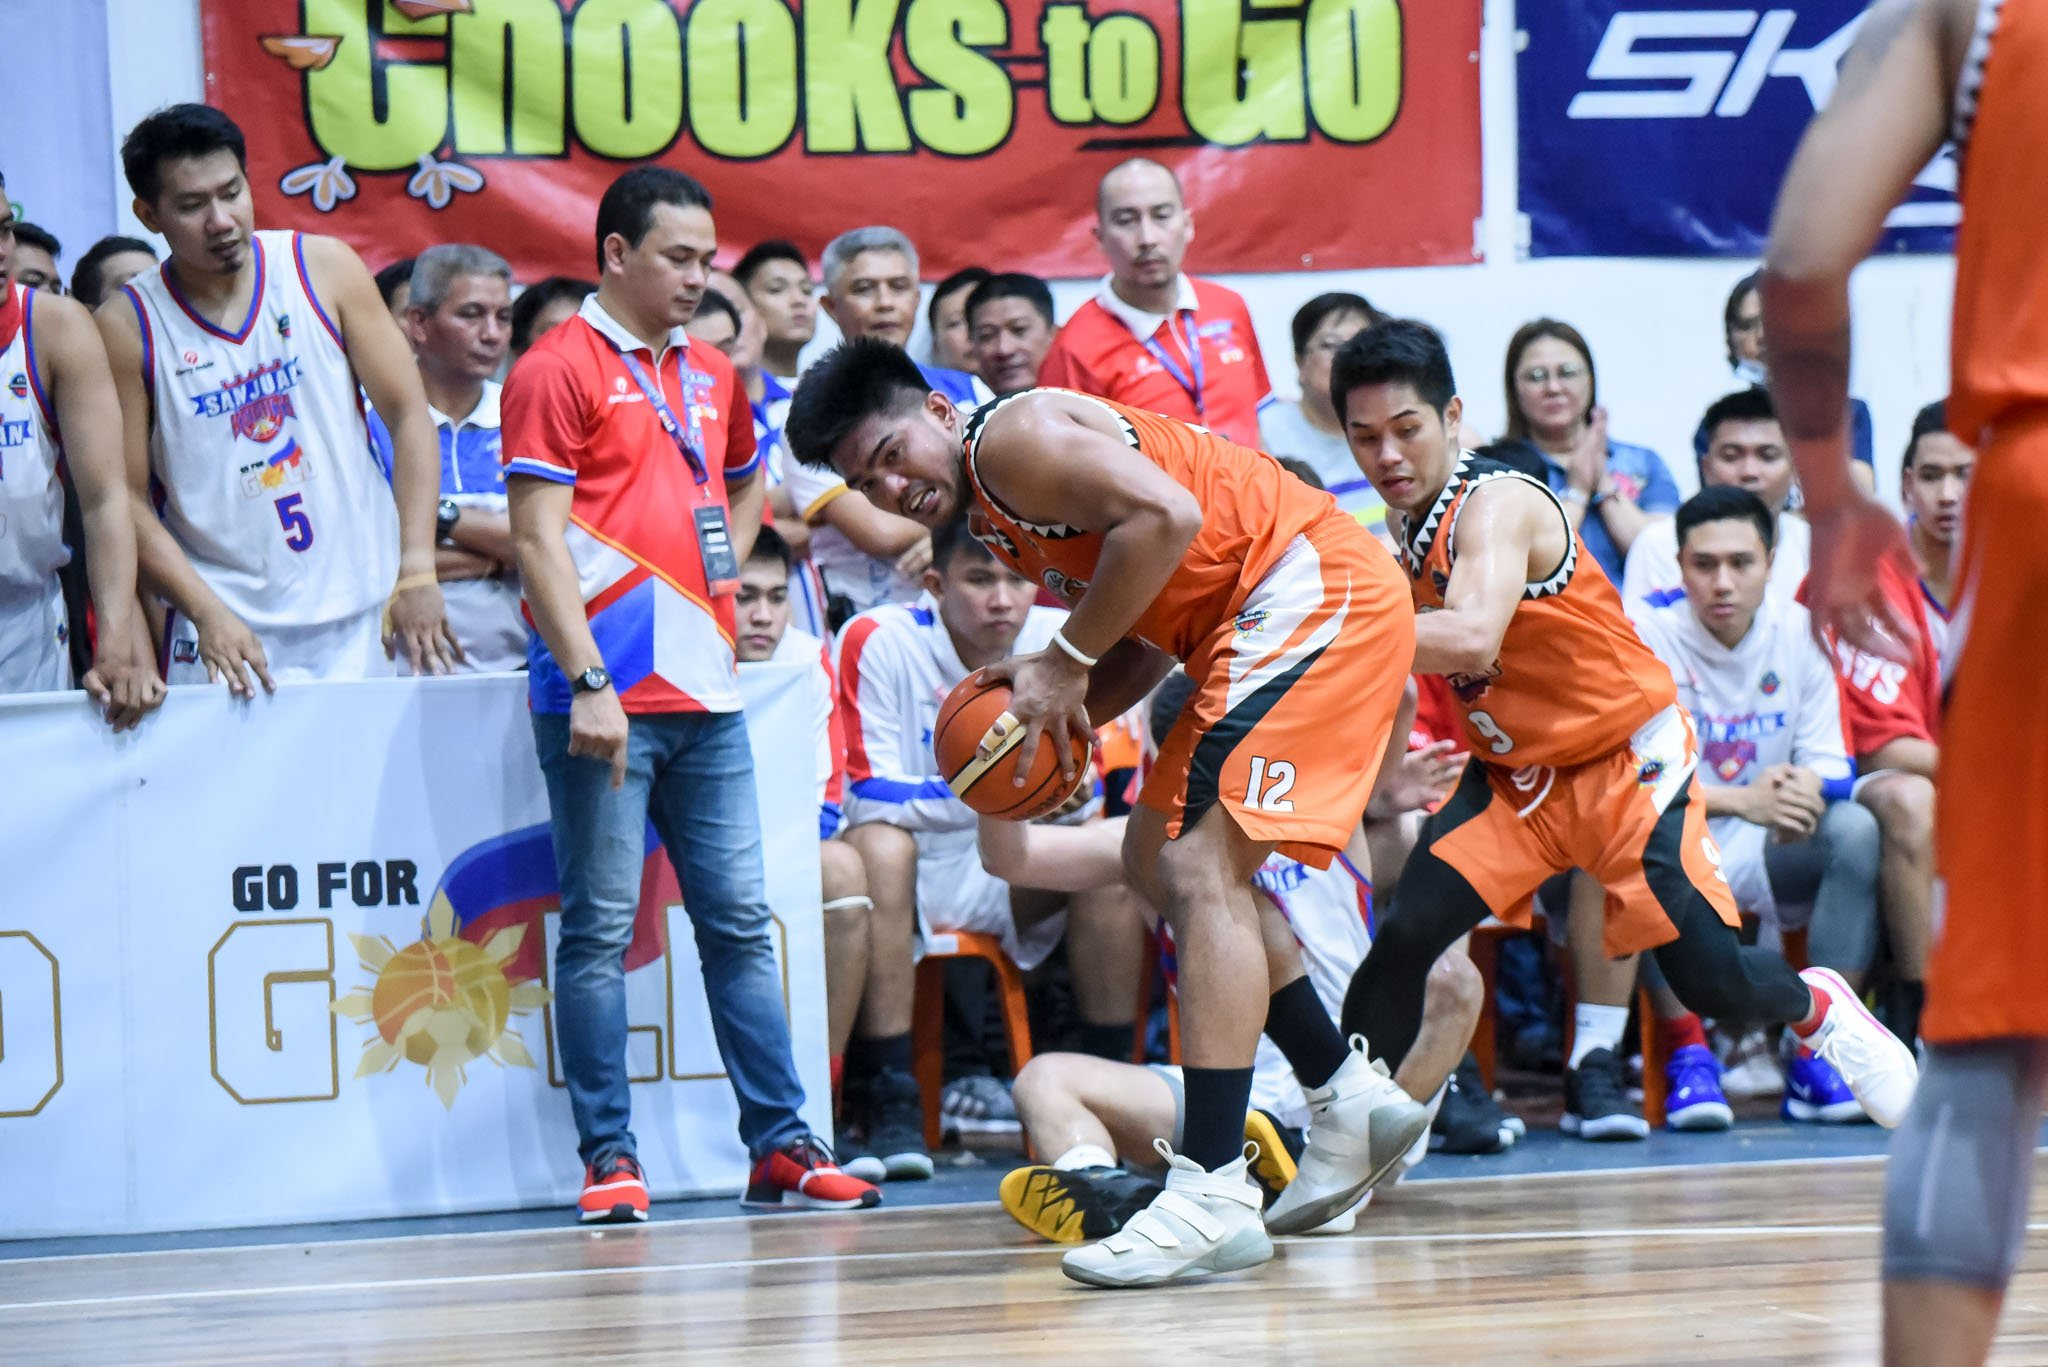 Tiebreaker Times Dexter Maiquez confident Pampanga will shine brighter next MPBL season Basketball MPBL News  Pampanga Giant Green Lanterns Dexter Maiquez 2019-20 MPBL Lakan Cup